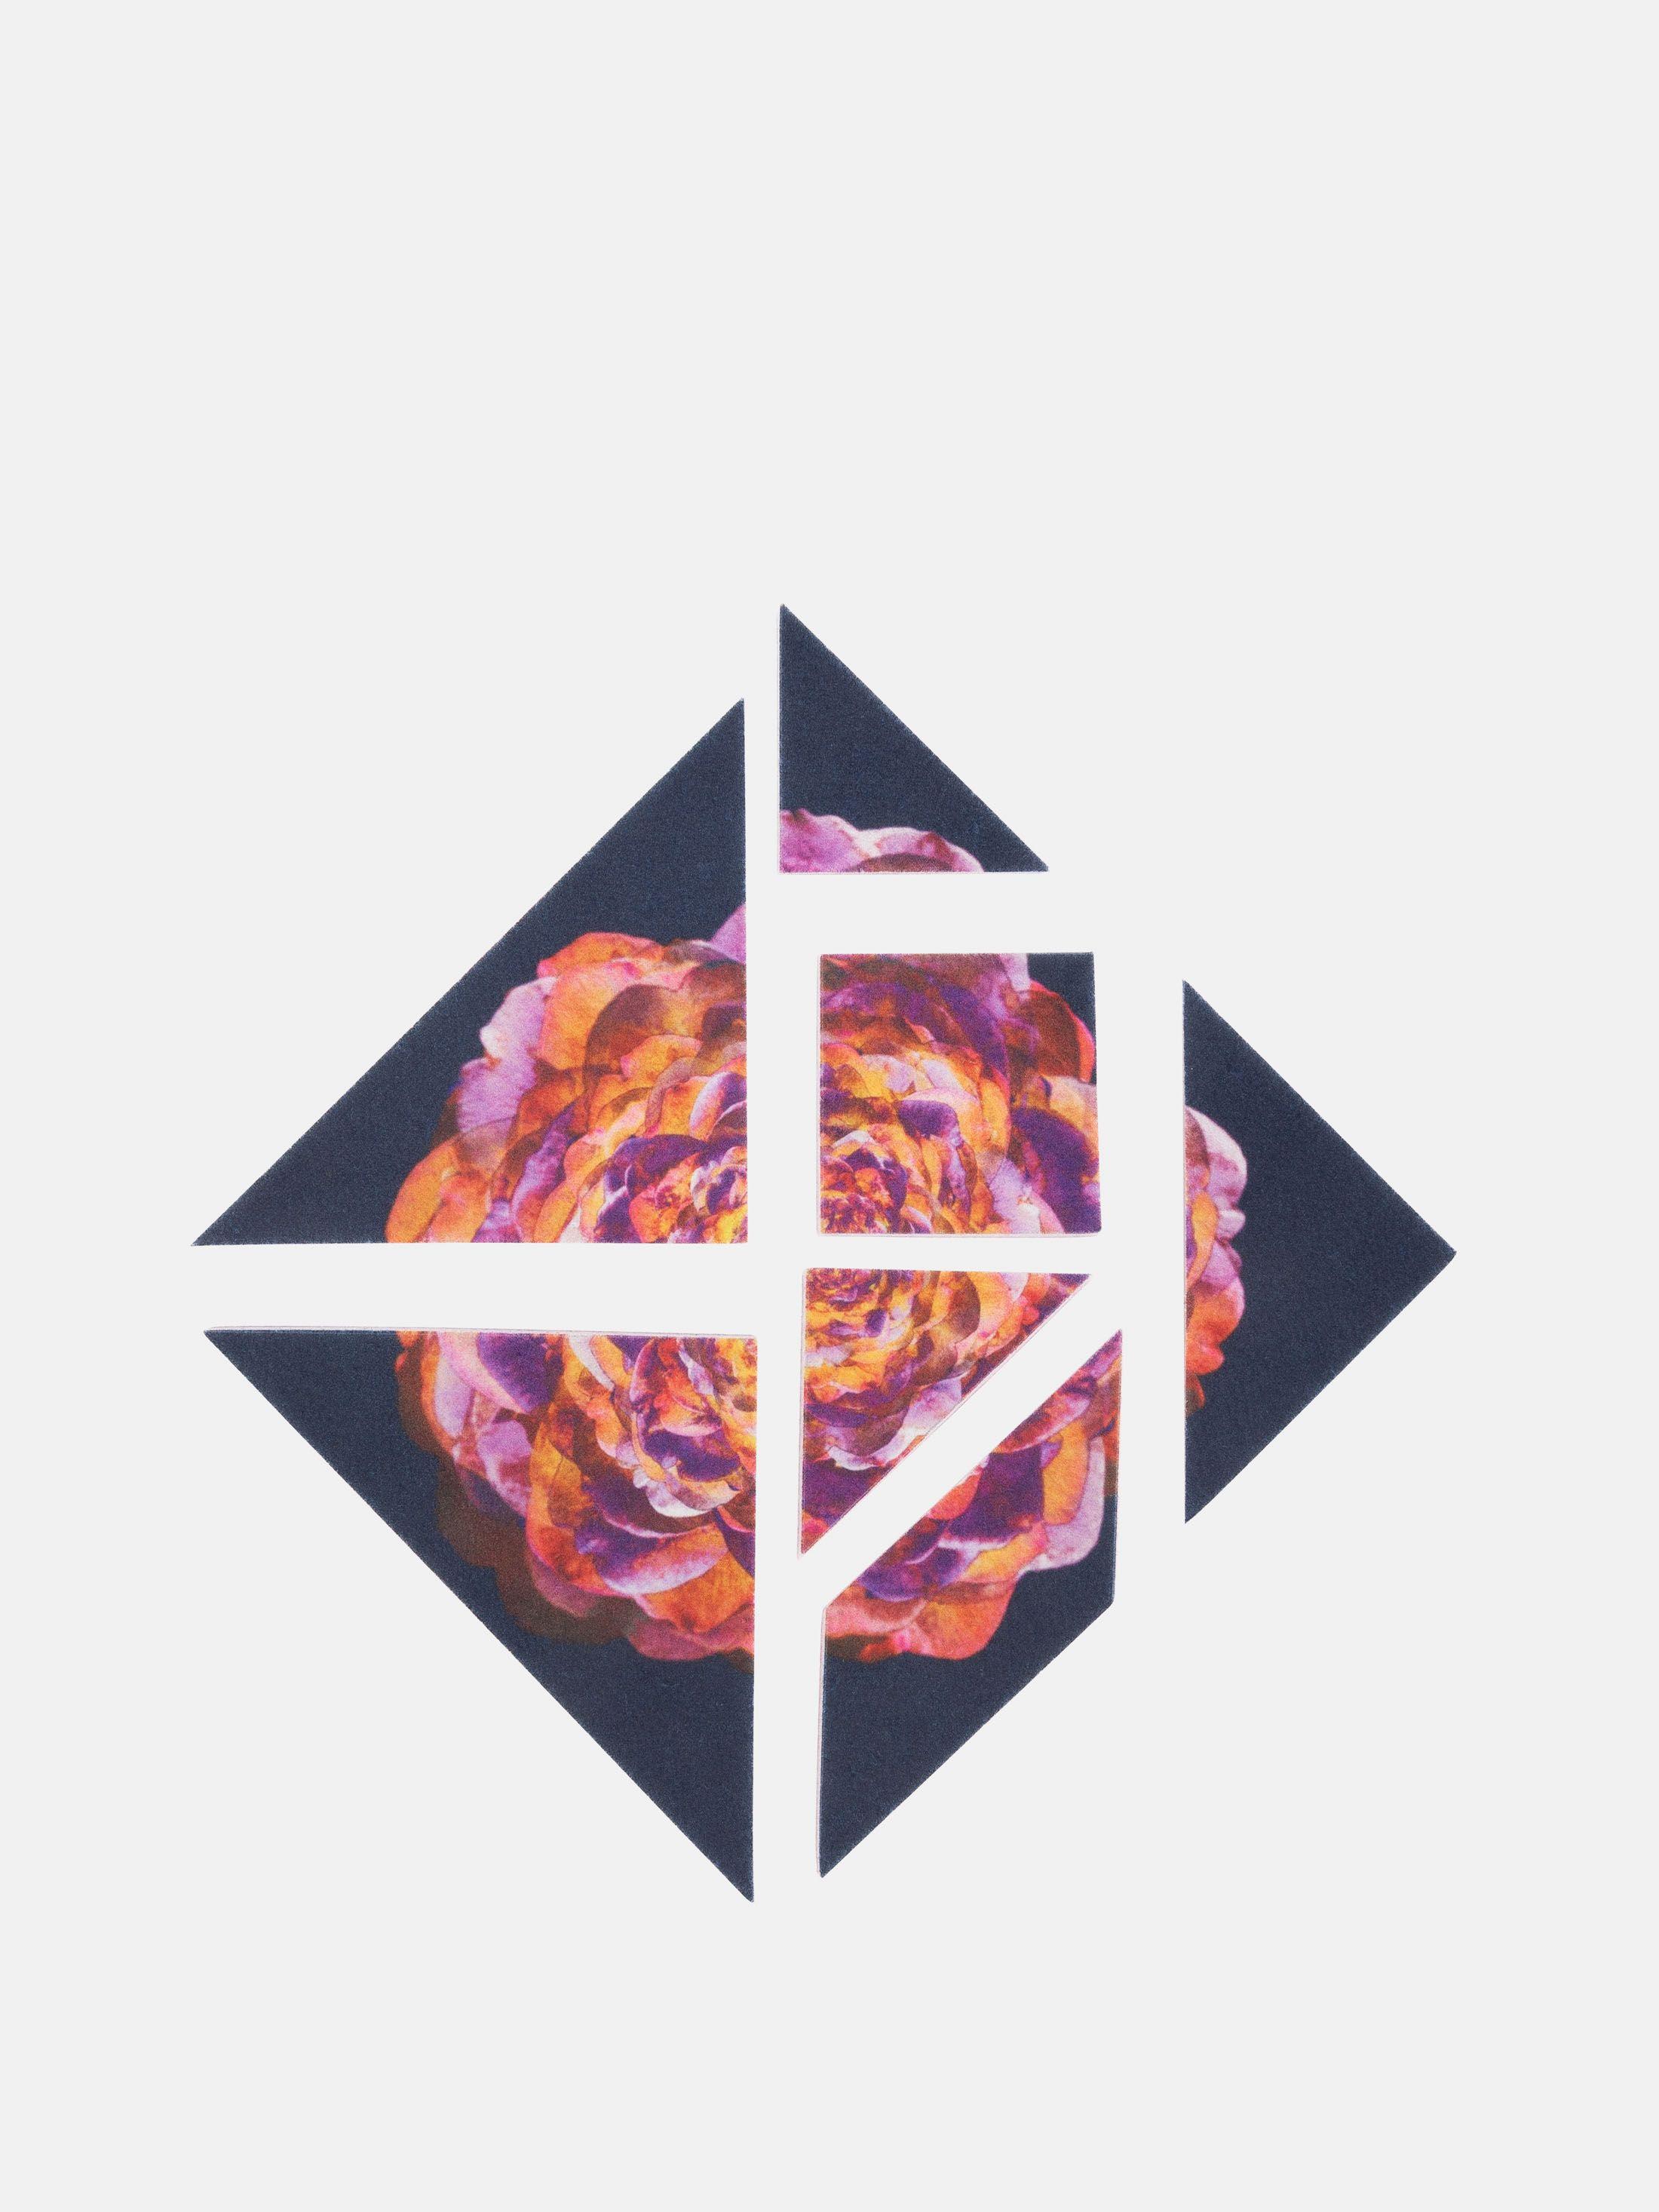 tangram puzzle mit blumenmotiven lifestyle